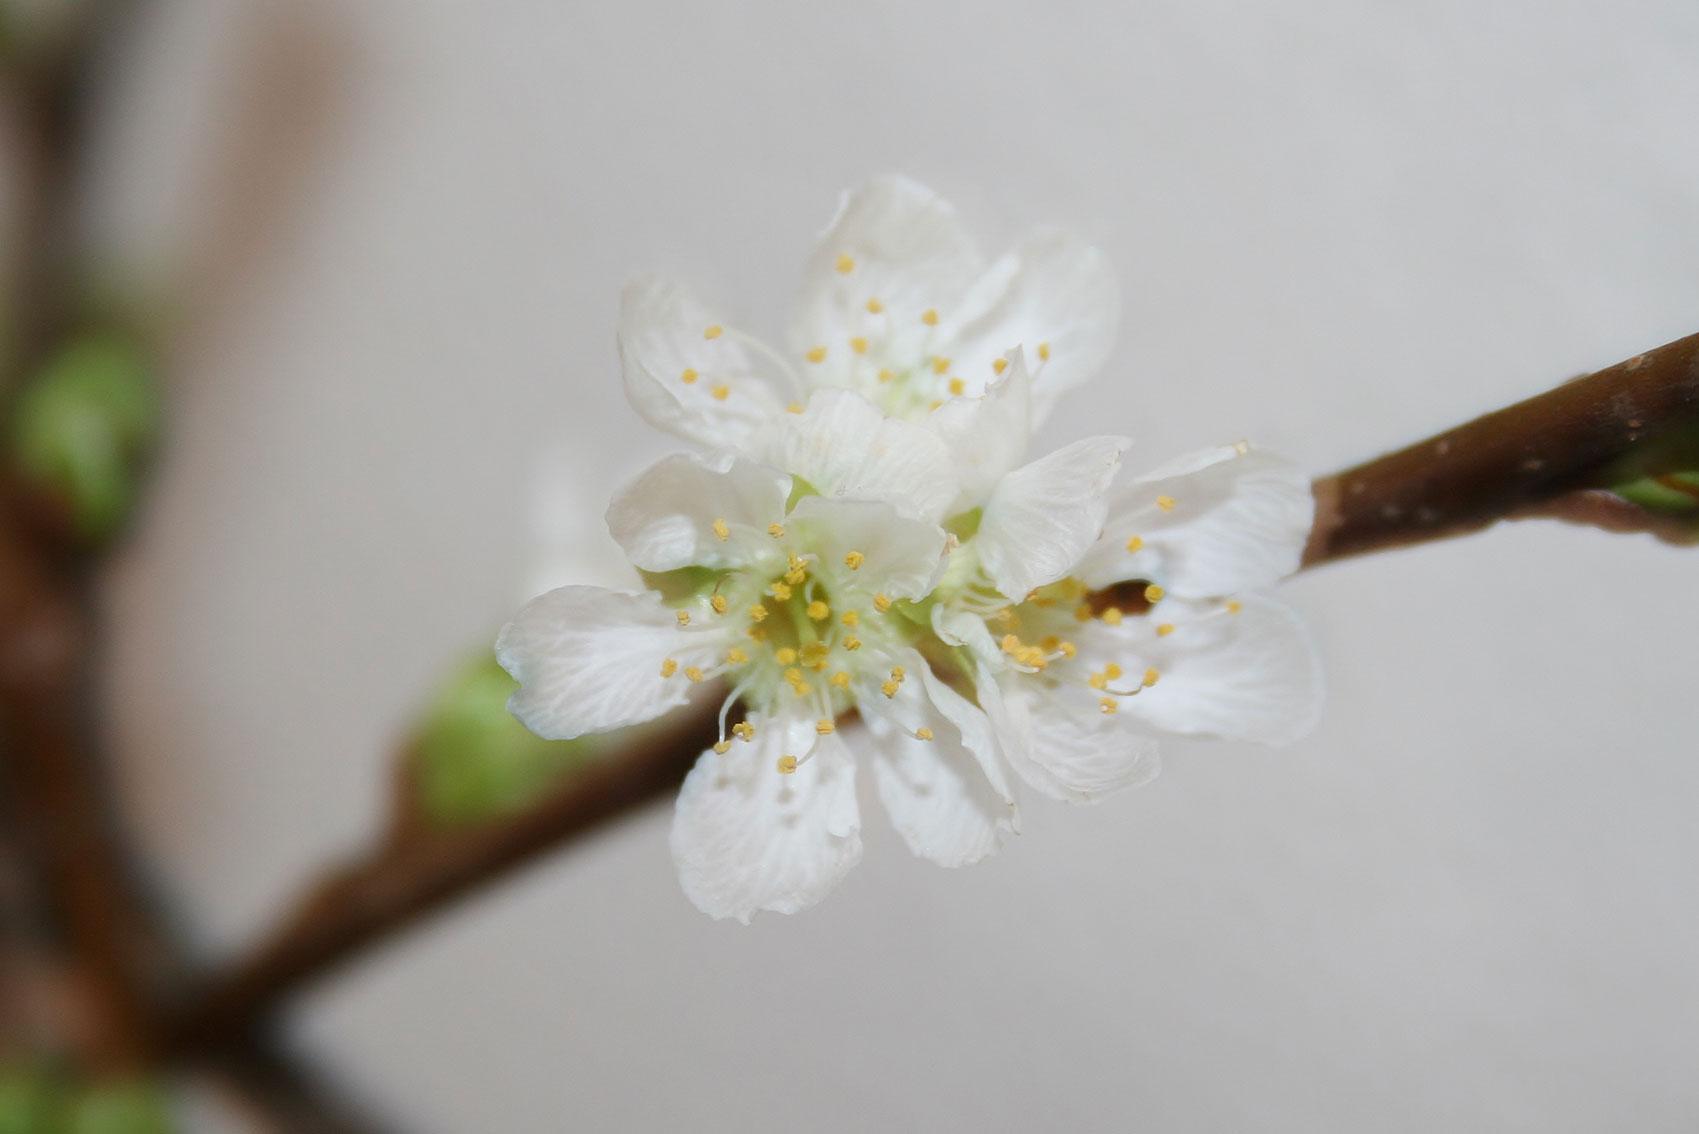 Appel-bloesem